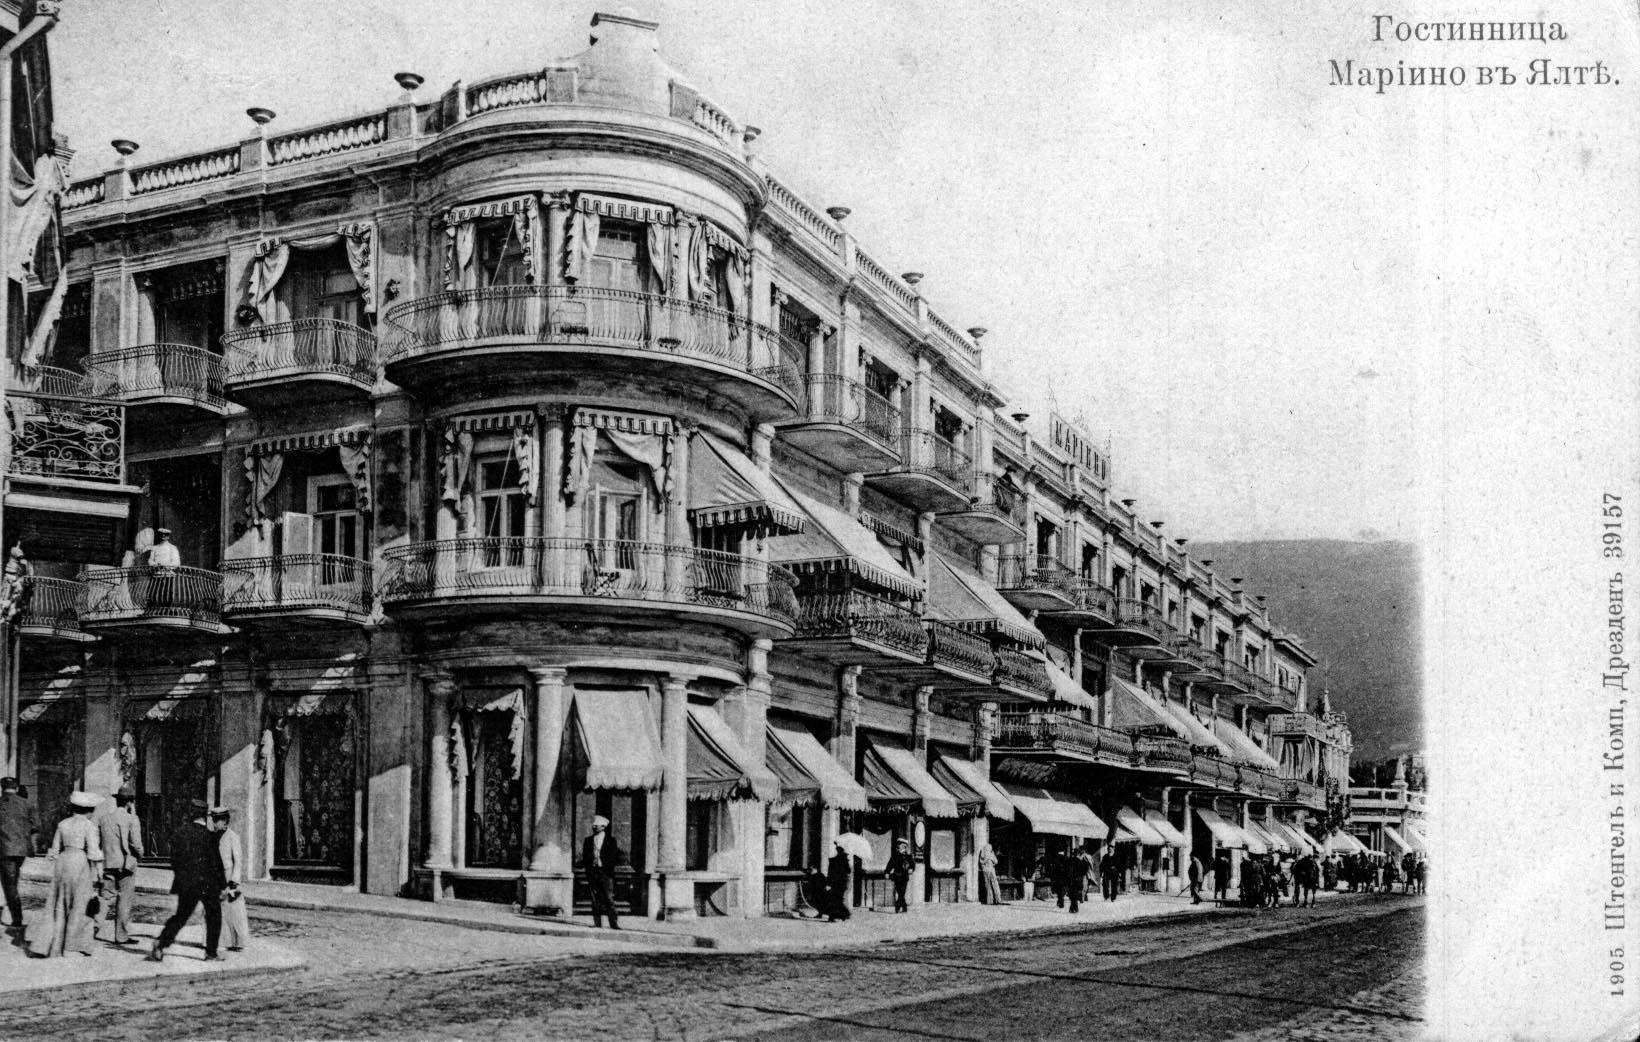 https://upload.wikimedia.org/wikipedia/commons/d/dc/Yalta_old_8_lg.jpg